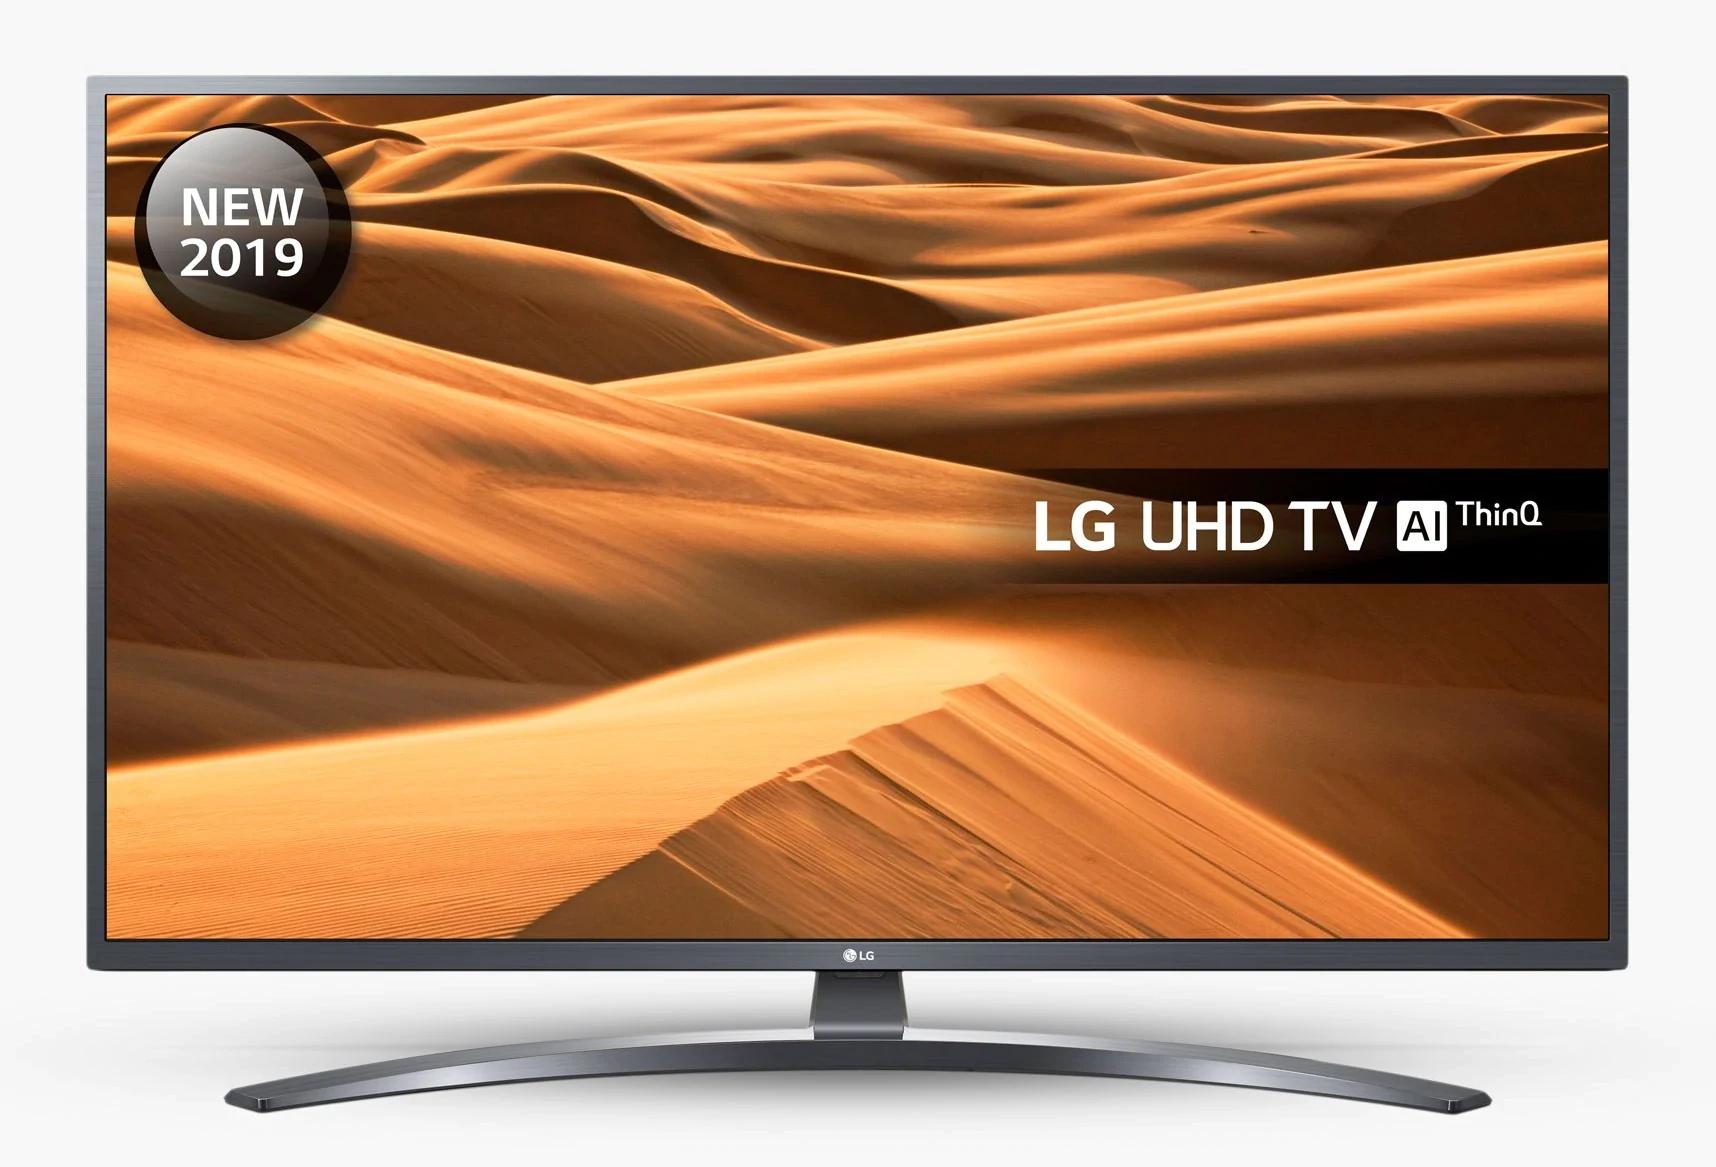 "LG 55UM7400PLB (2019) LED HDR 4K UHD Smart TV, 55"" with Freeview Play/Freesat HD, Dark Iron Grey - £399 @ John Lewis & Partners"